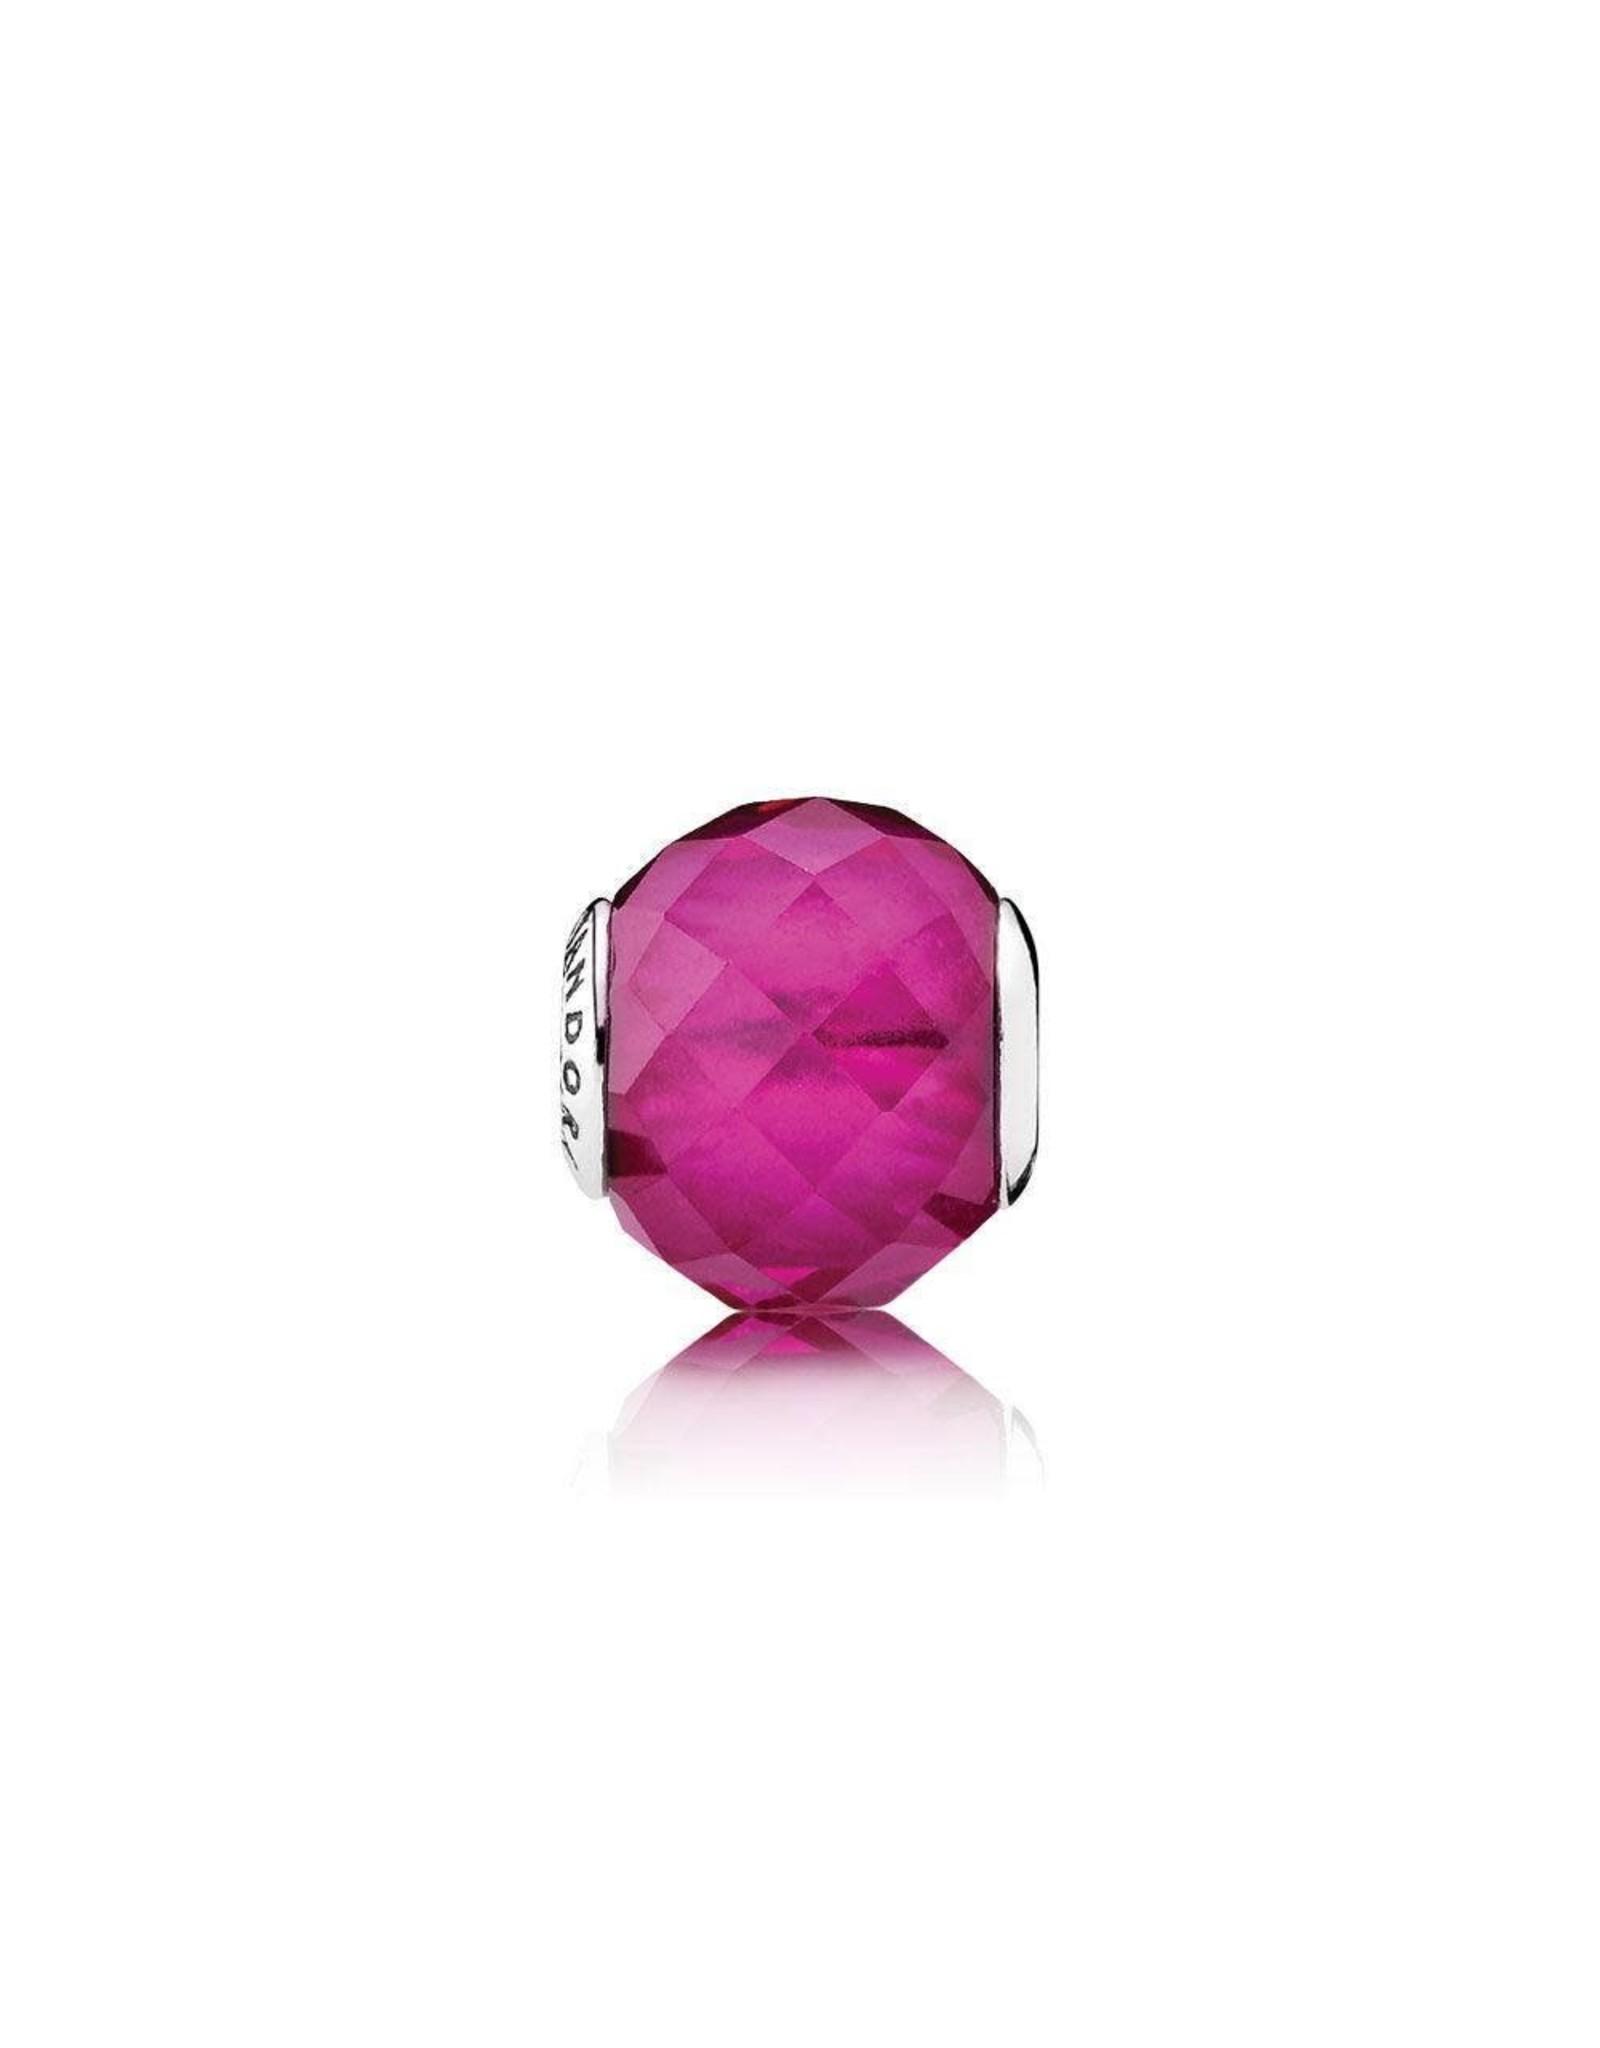 Pandora Pandora Essence Charm, Happiness, Synthetic Ruby